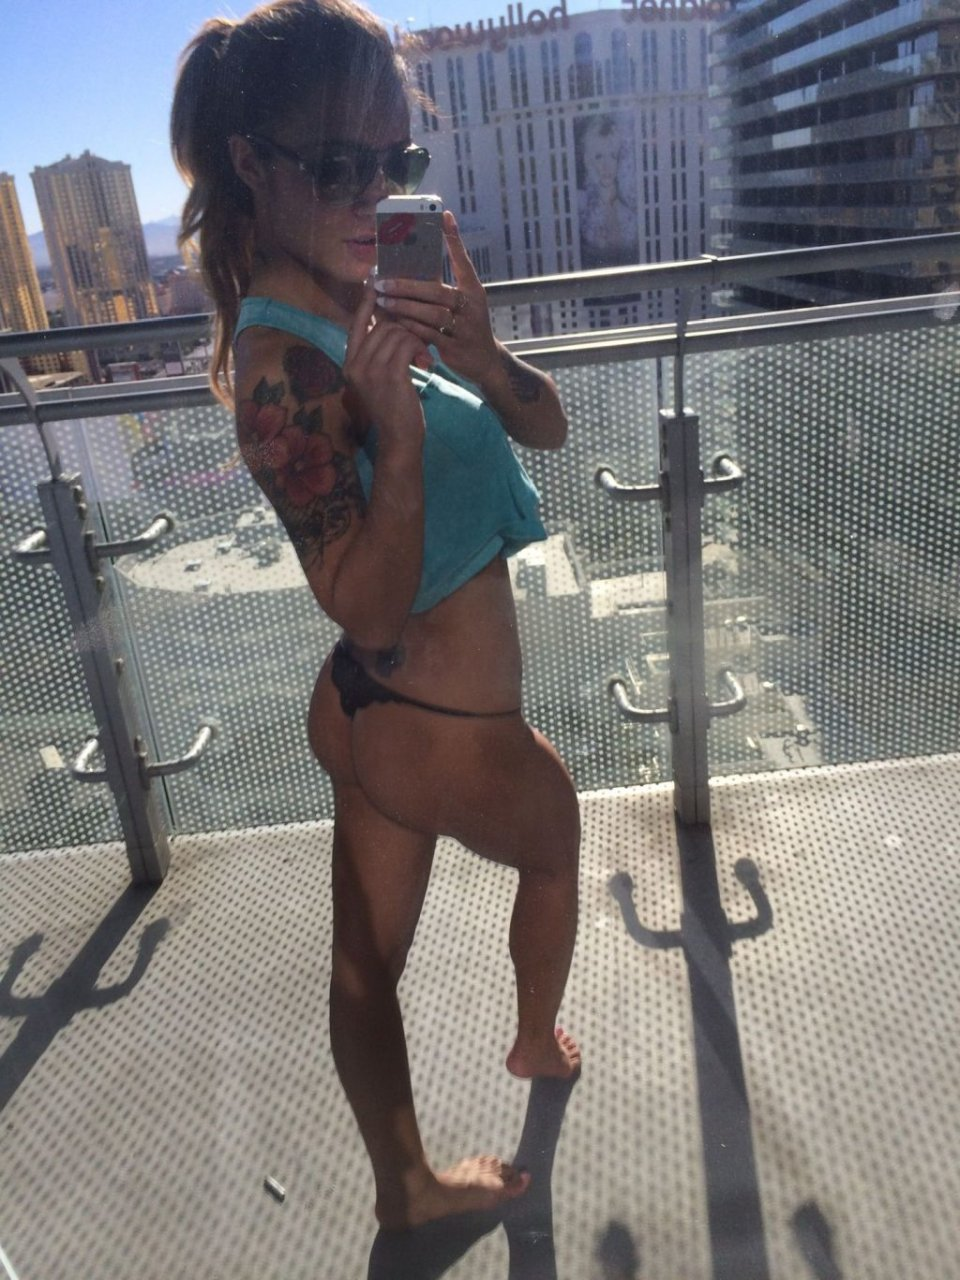 Mariah Corpus (Ryahroses) Nude Leaked The Fappening (116 Photos + 5 Videos)